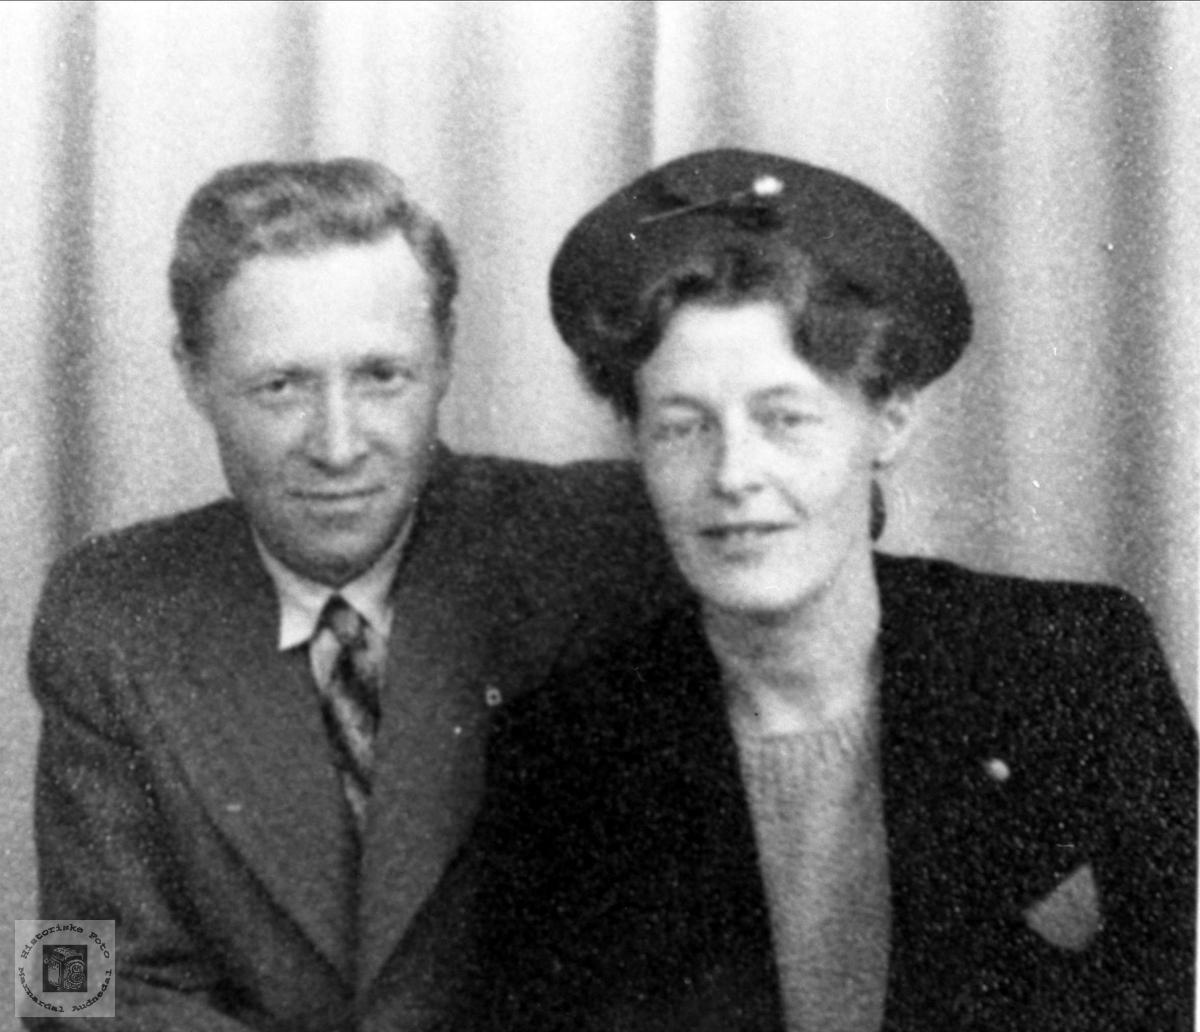 Portrett av Konrad Koland og Randi Haugland gift Koland, Bjelland.